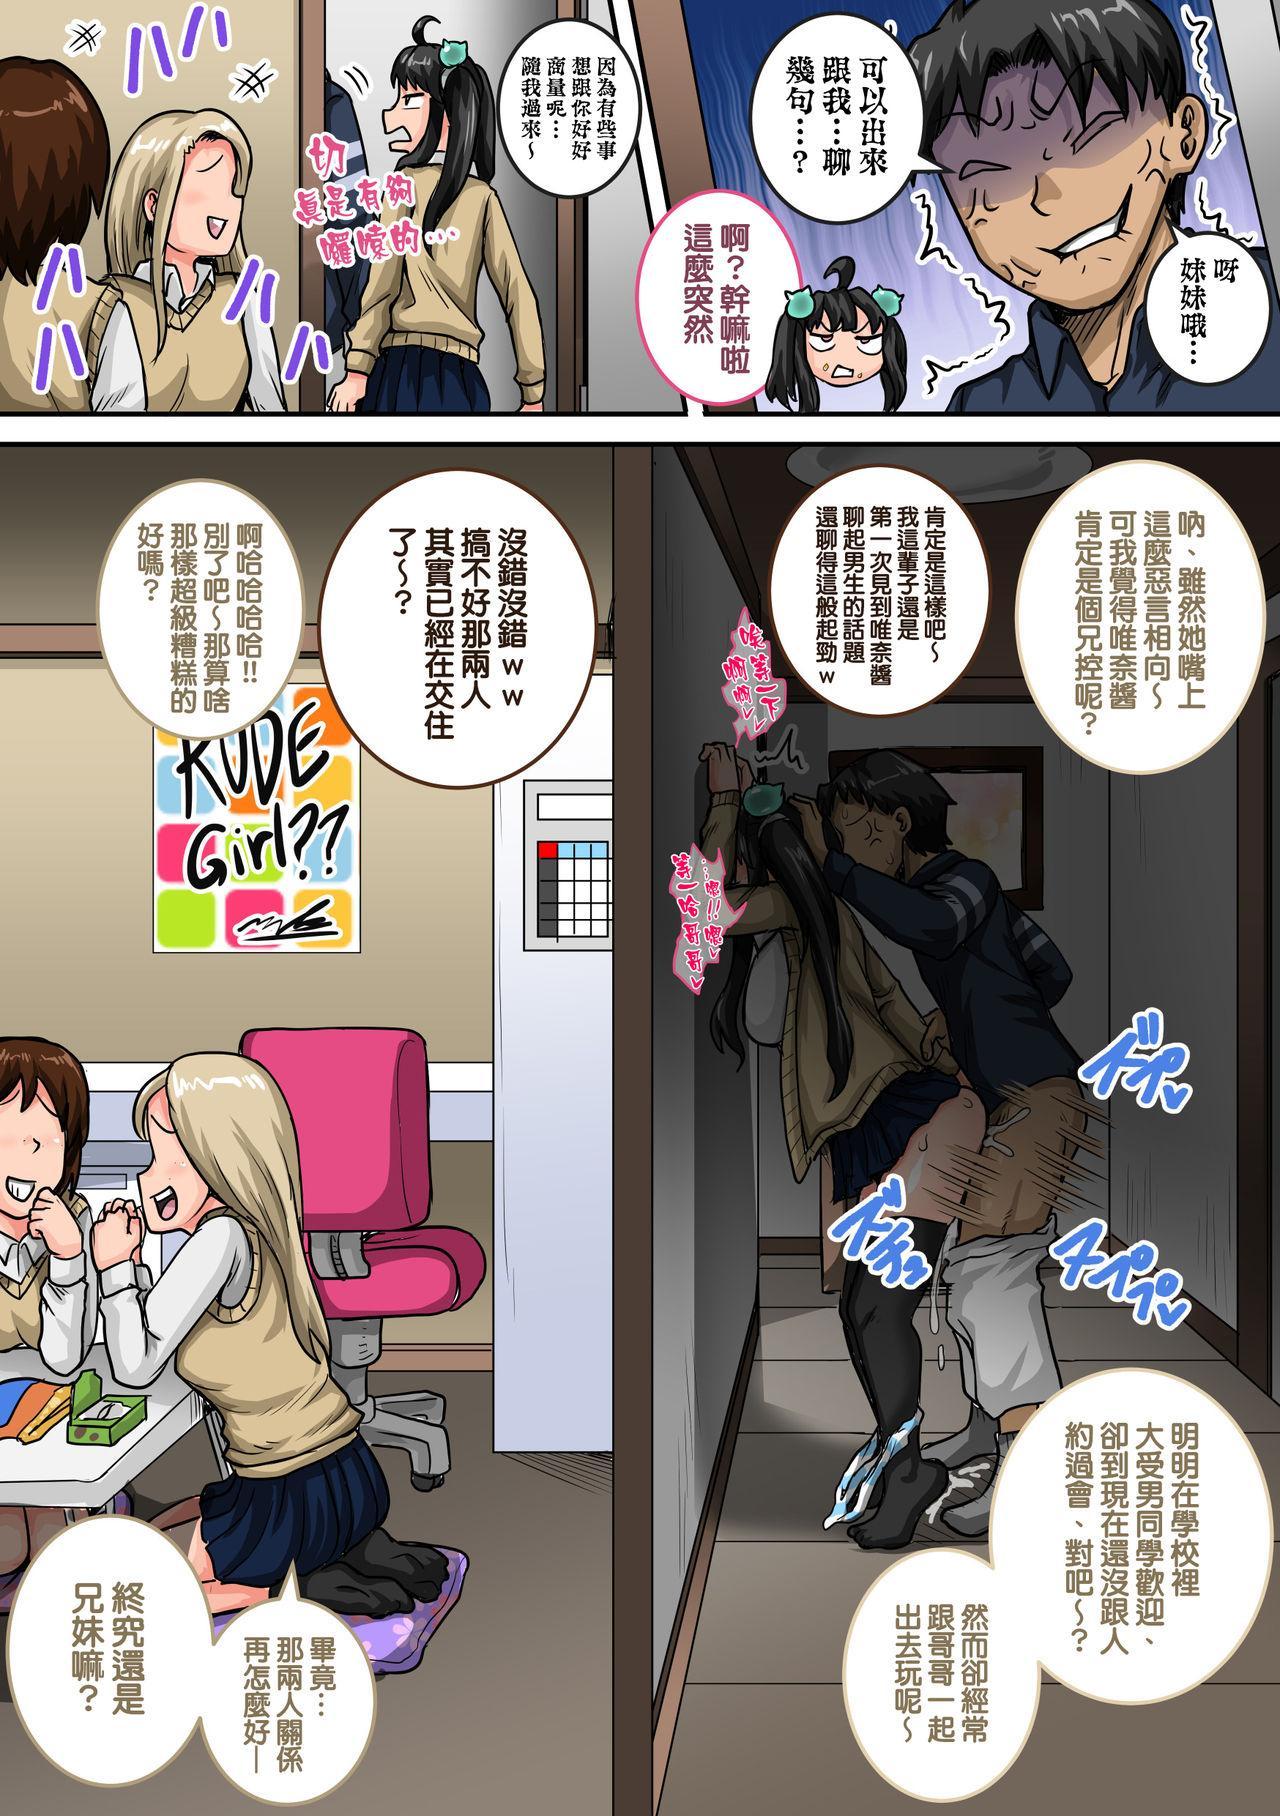 [Juna Juna Juice] Mukatsuku Imouto wa Chanto Shikaranakucha 1~15 Matome   讓人氣憤的妹妹必須給她好好訓斥一頓1~15 合集 [Chinese] [天帝哥個人漢化] 22